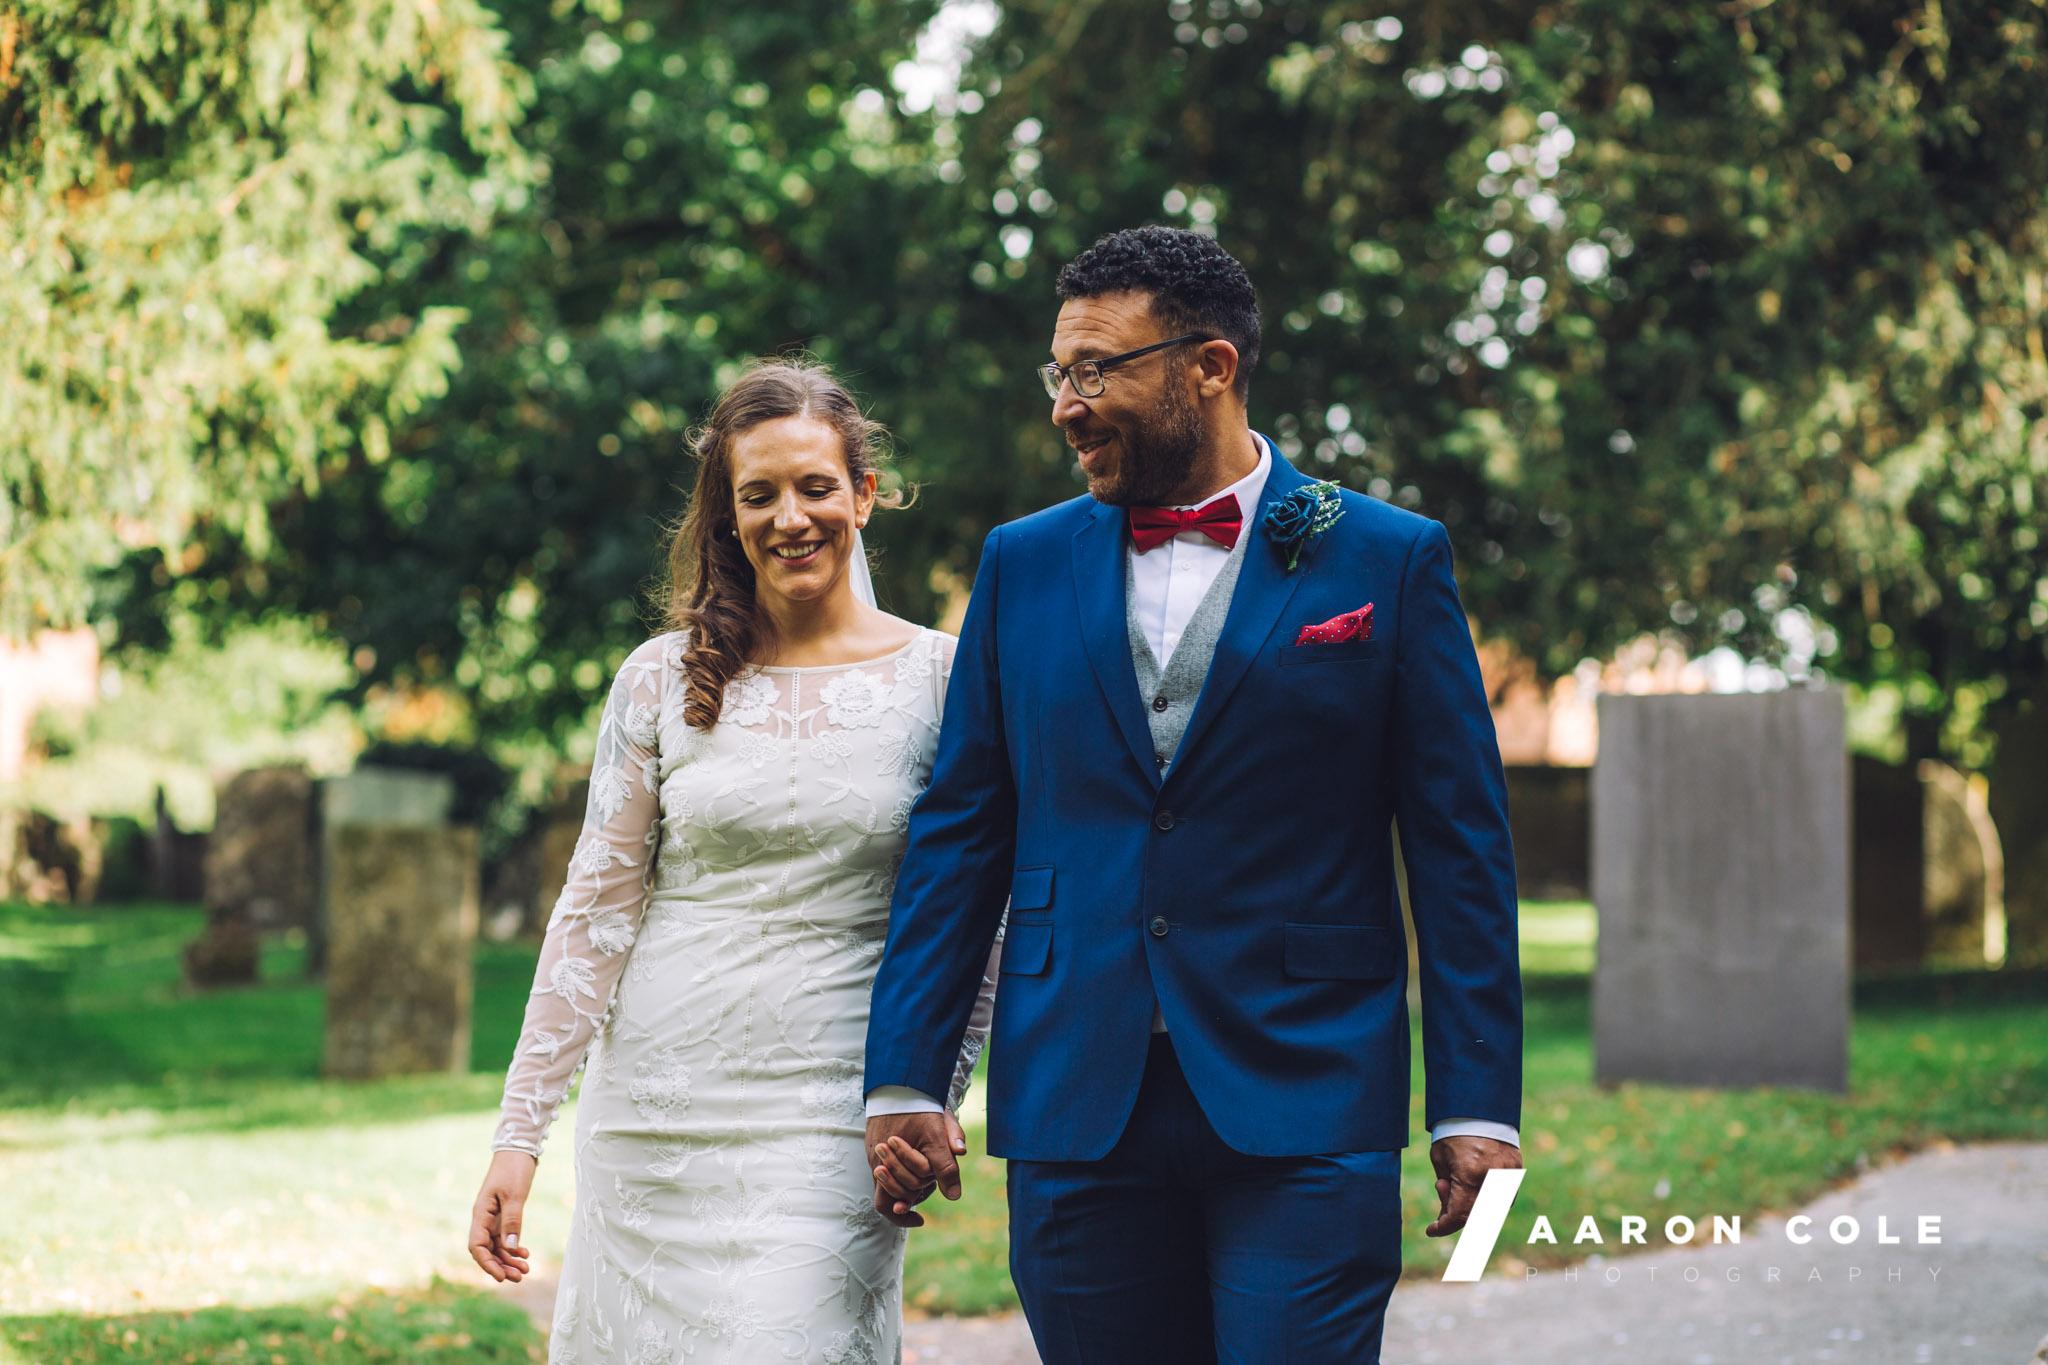 Collingham wedding